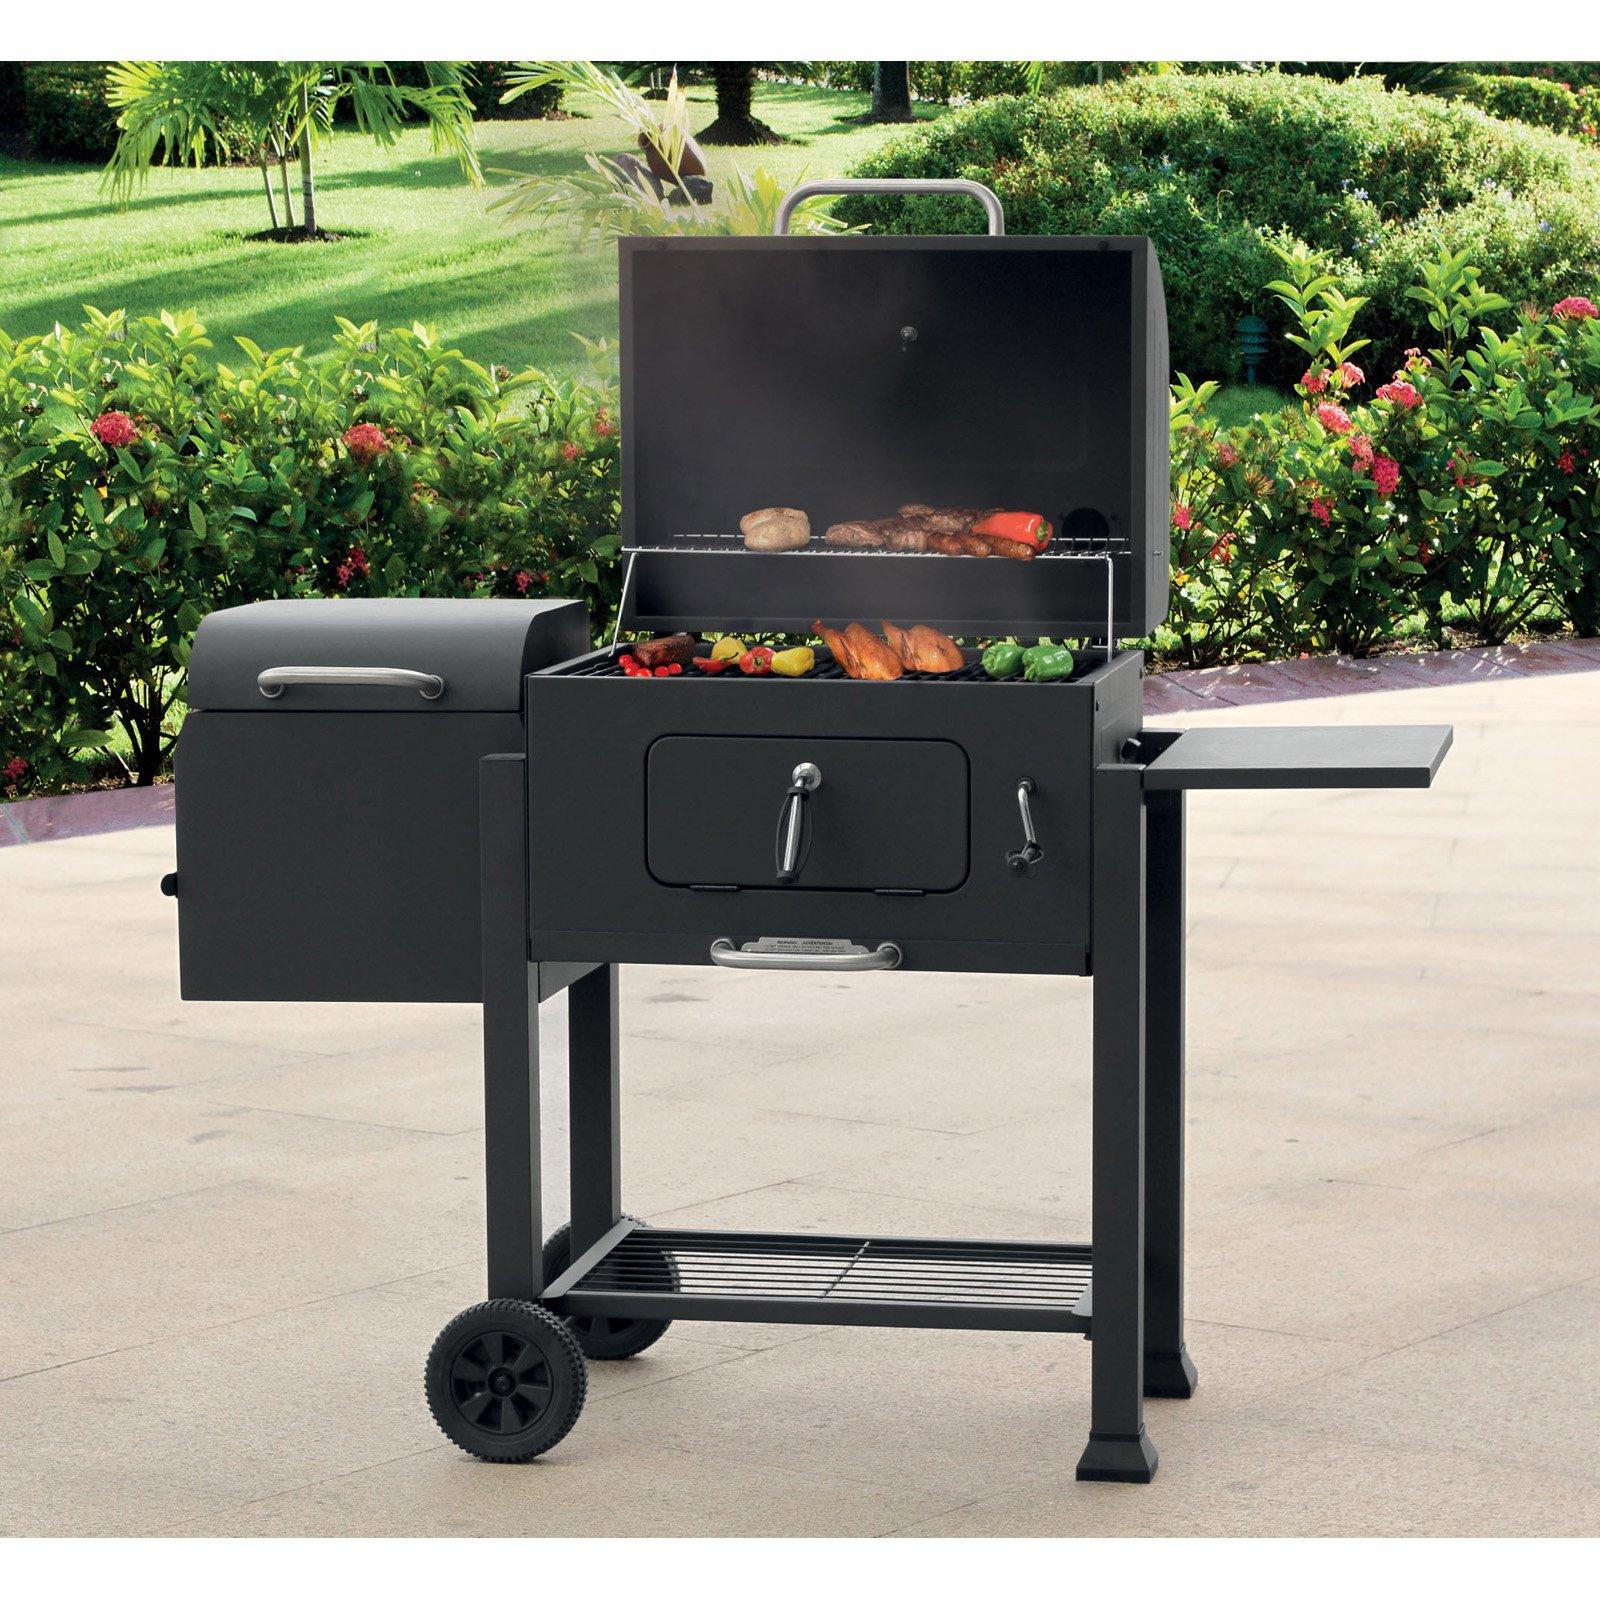 Landmann USA Vista Barbecue Charcoal Grill with Offset Smoker Box by Landmann